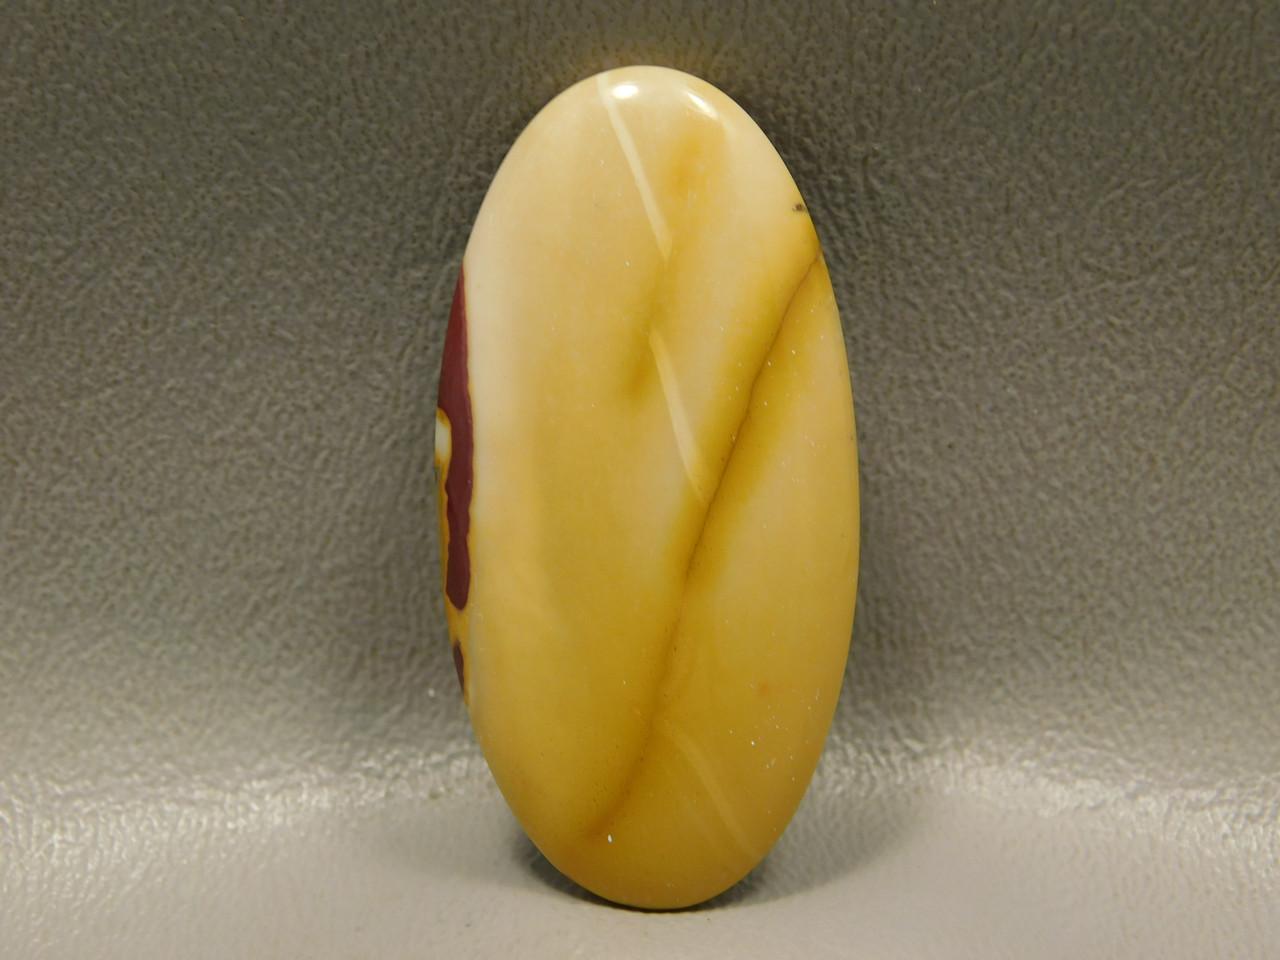 Mookaite Jasper Yellow and Red Cabochon Australia Gemstone #2